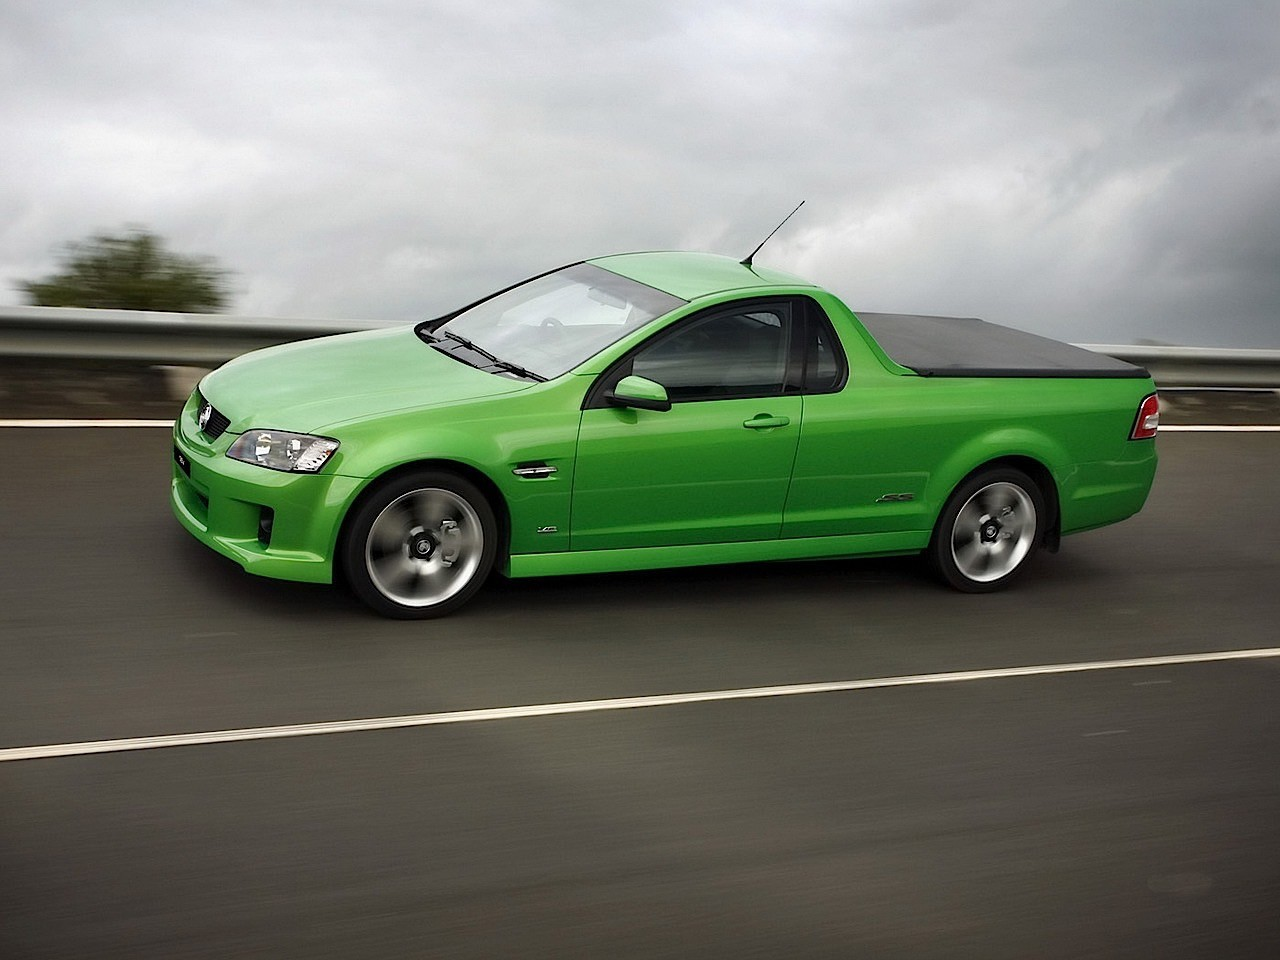 Holden Ute Specs 2007 2008 2009 2010 2011 2012 2013 Autoevolution